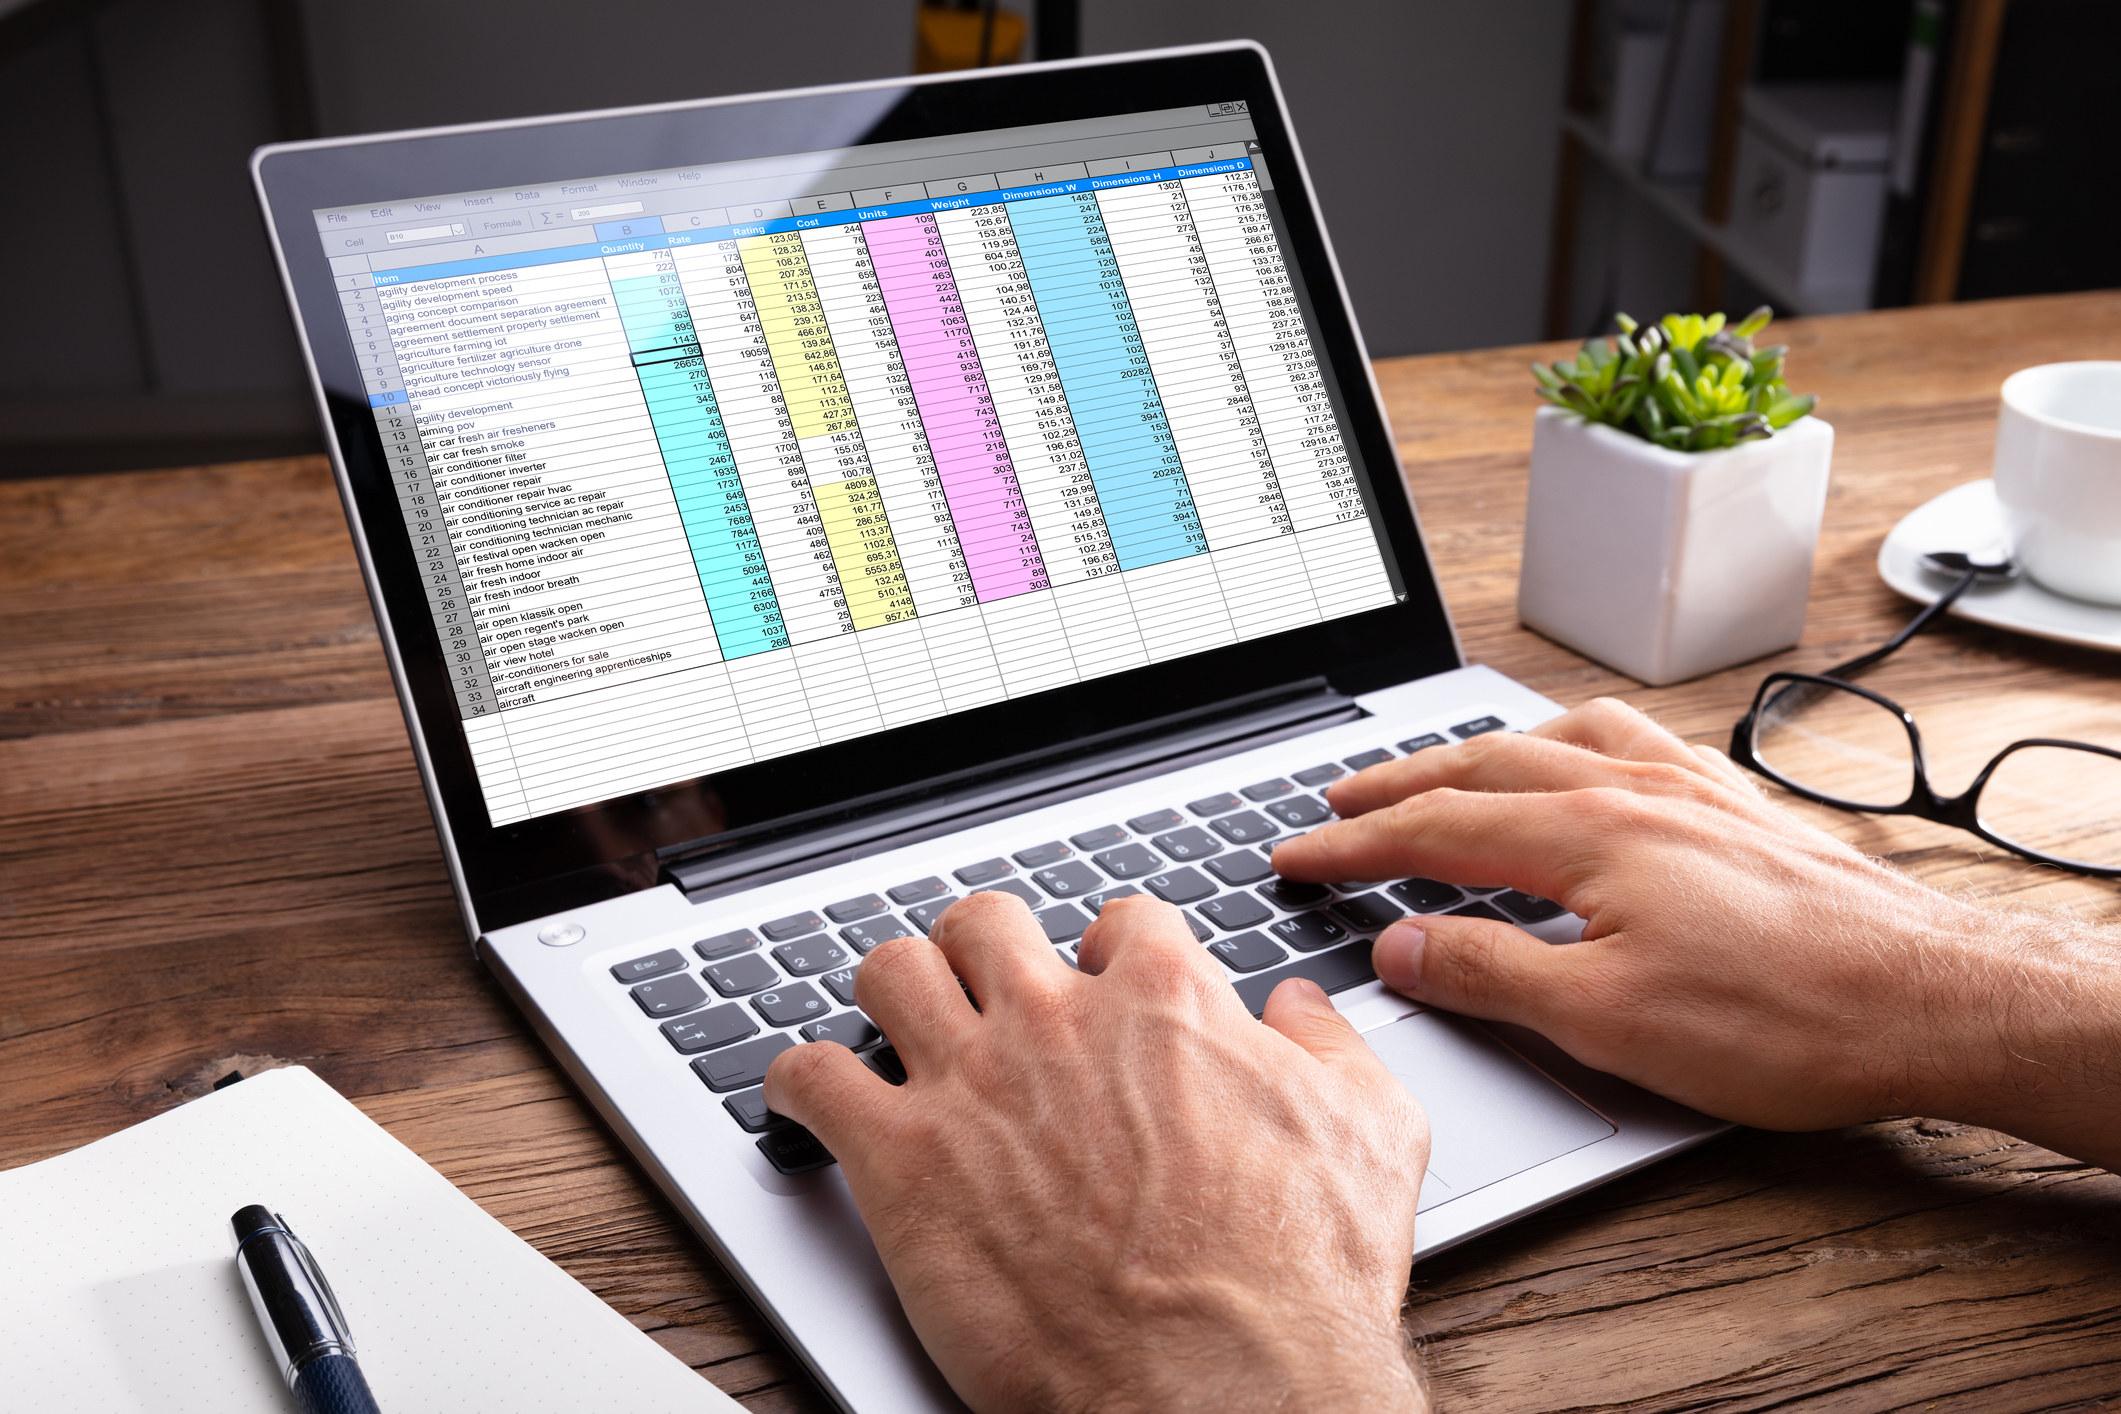 A spreadsheet on a laptop